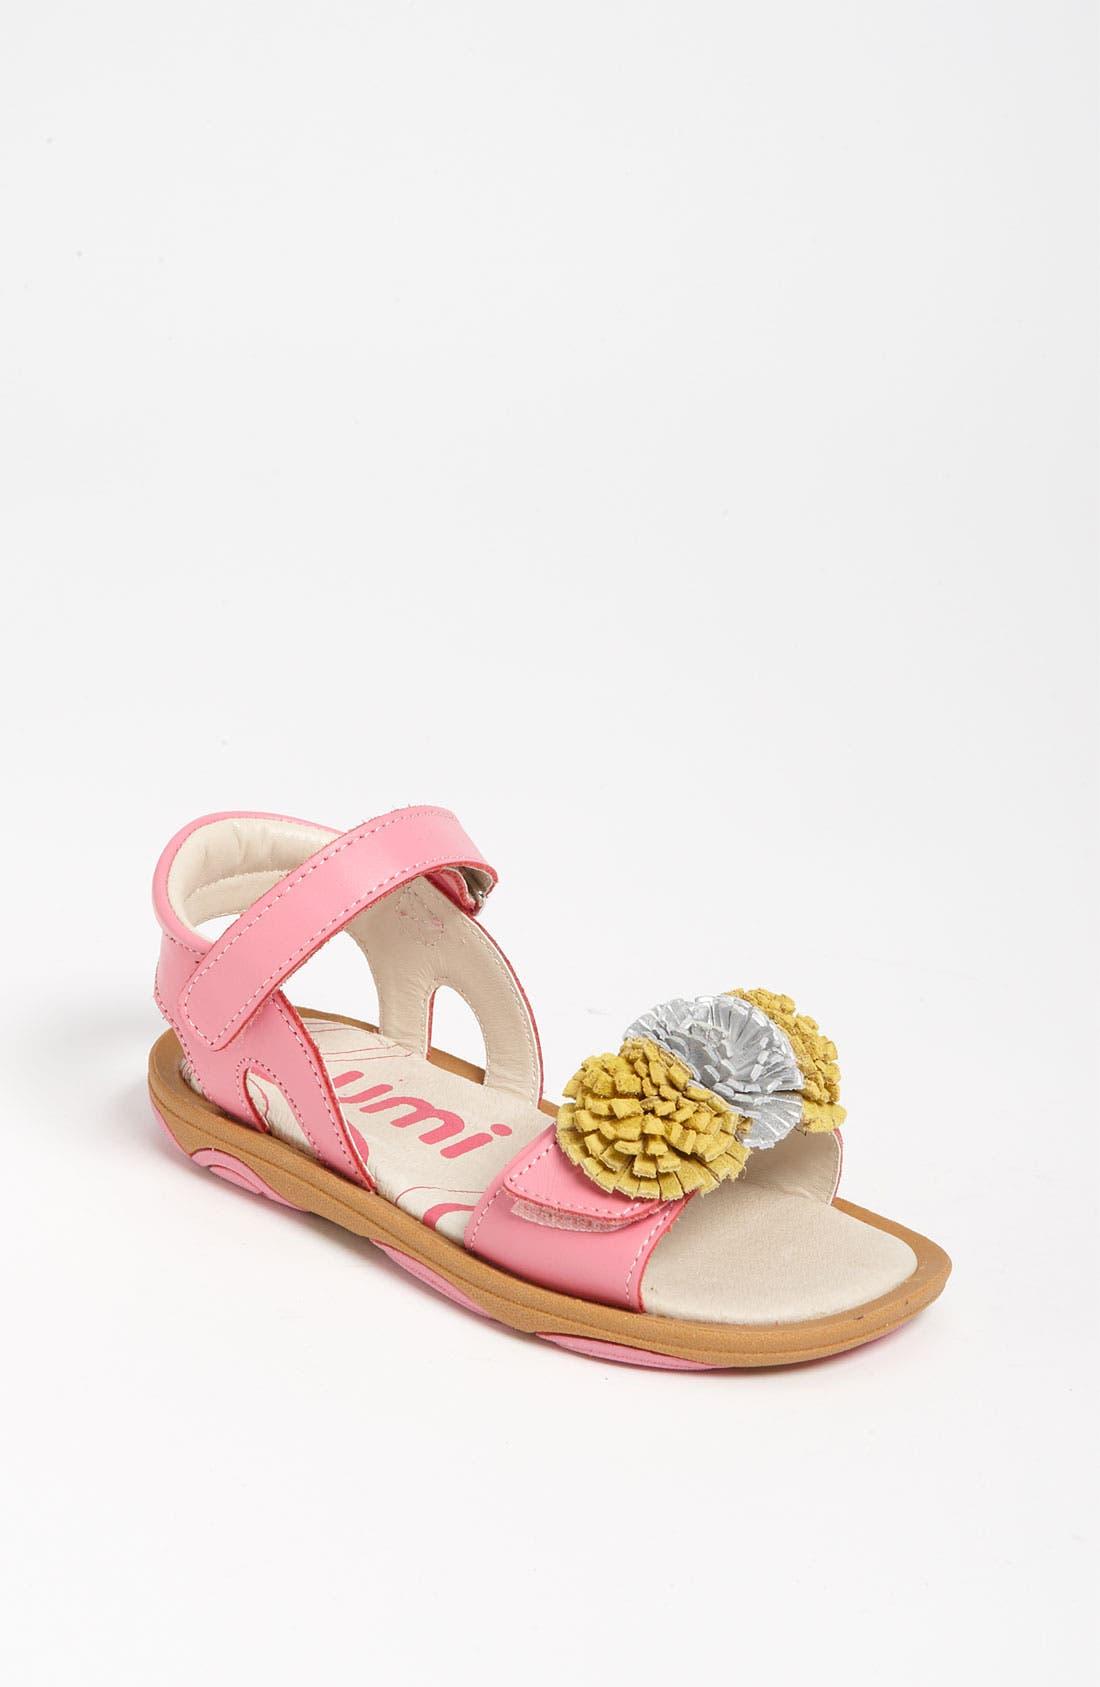 Alternate Image 1 Selected - Umi 'Serenna' Adjustable Sandal (Toddler, Little Kid & Big Kid)